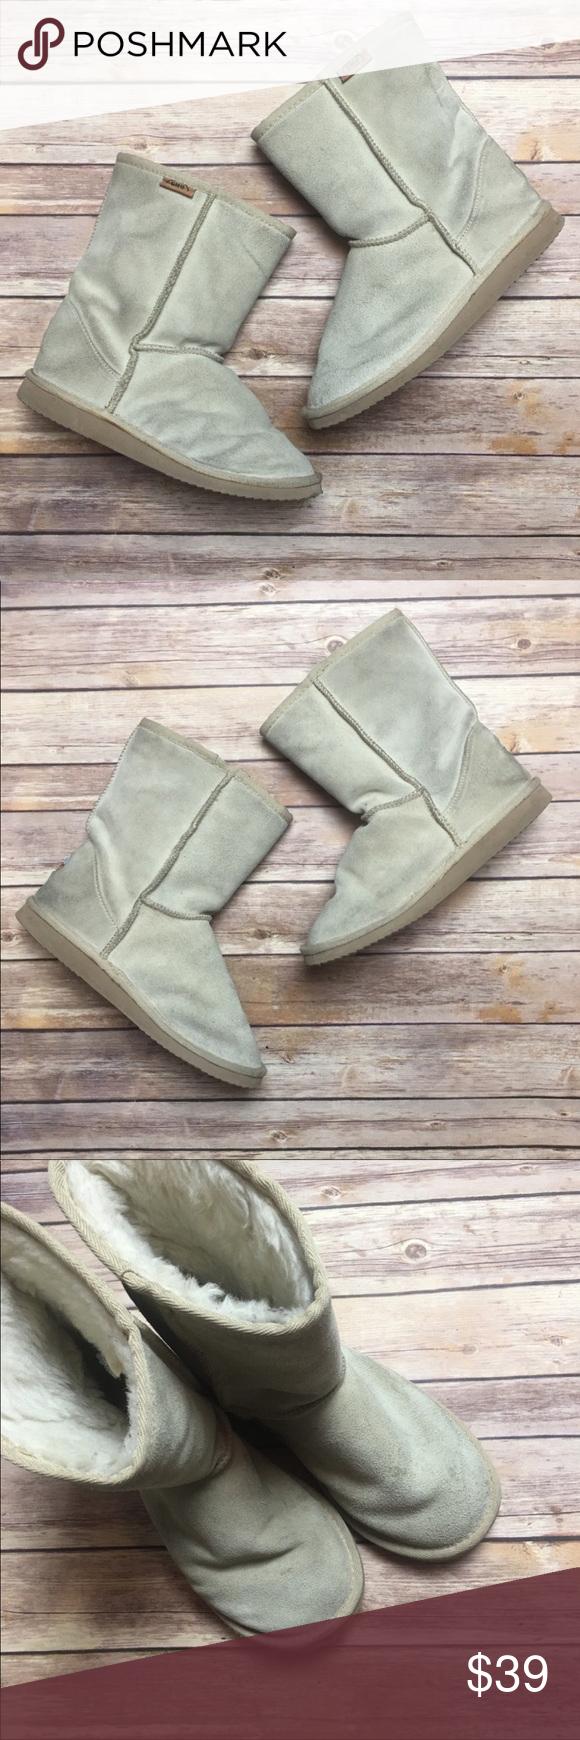 Emu Ridge  Sand Suede Classic Cozy Winter Boots Pullon style suede Wool line  Emu Ridge  Sand Suede Classic Cozy Winter Boots Pullon style suede Wool line